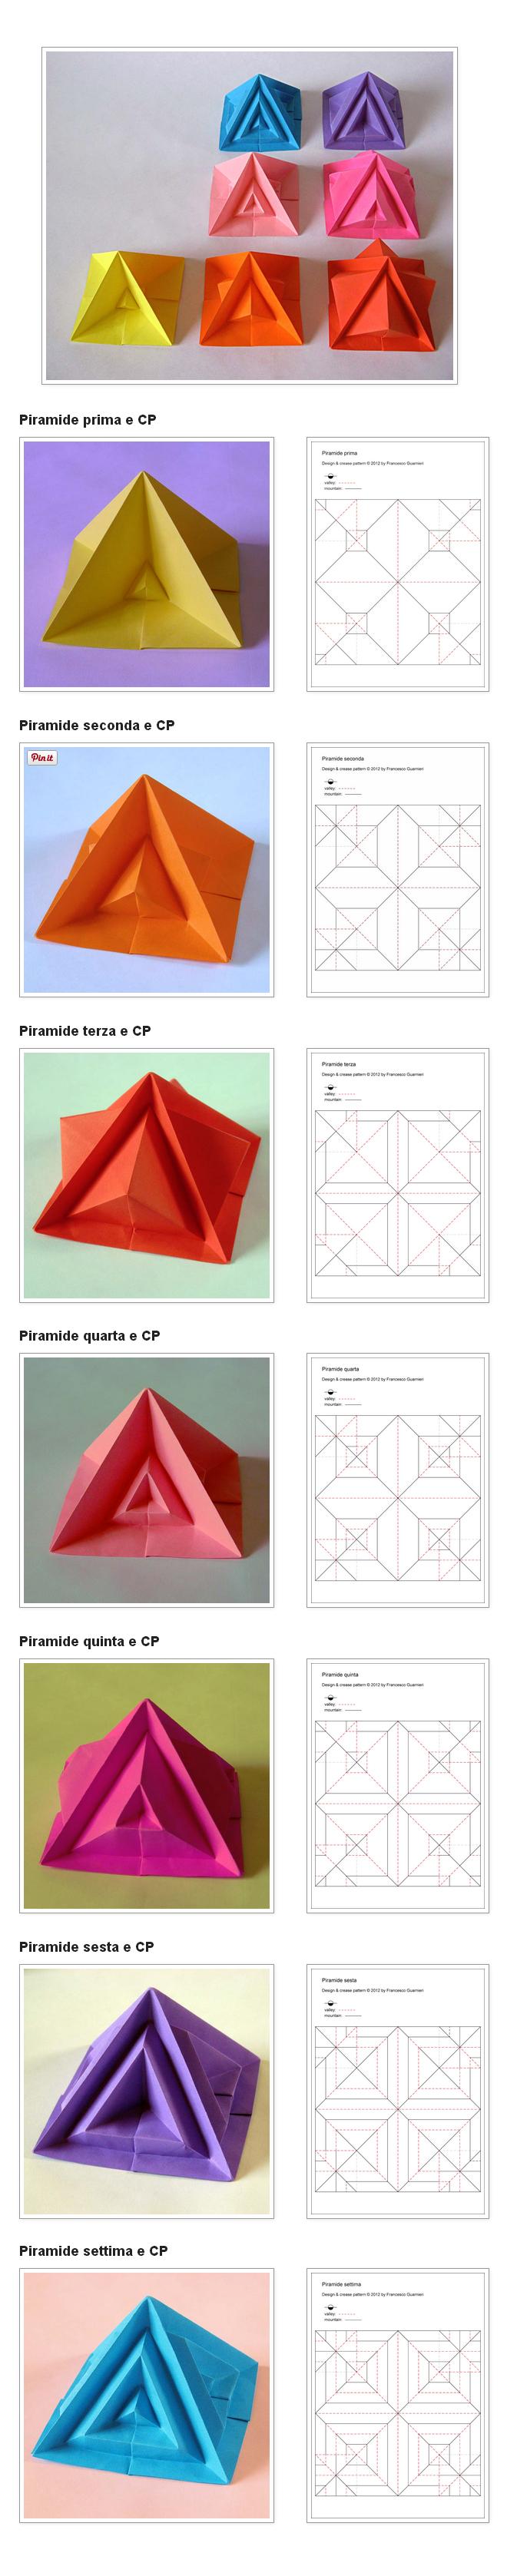 Origami: Piramide settima e varianti - Seventh pyramid and variants, by Francesco Guarnieri